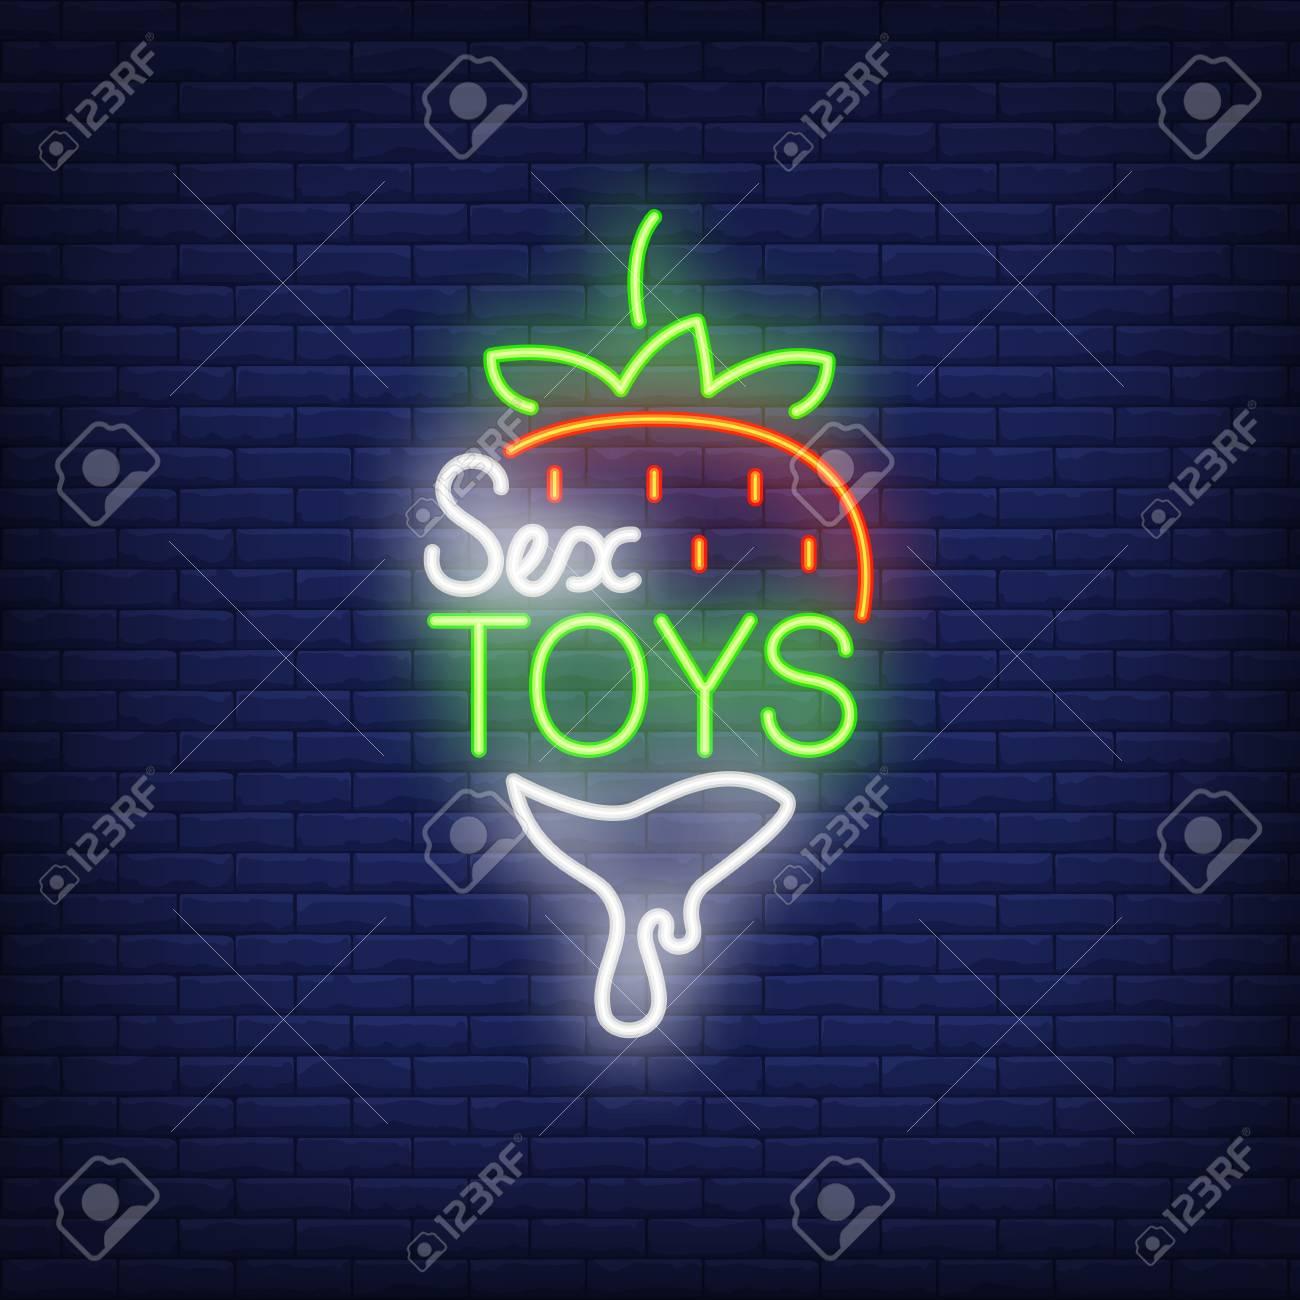 Erotic entertainment love toys